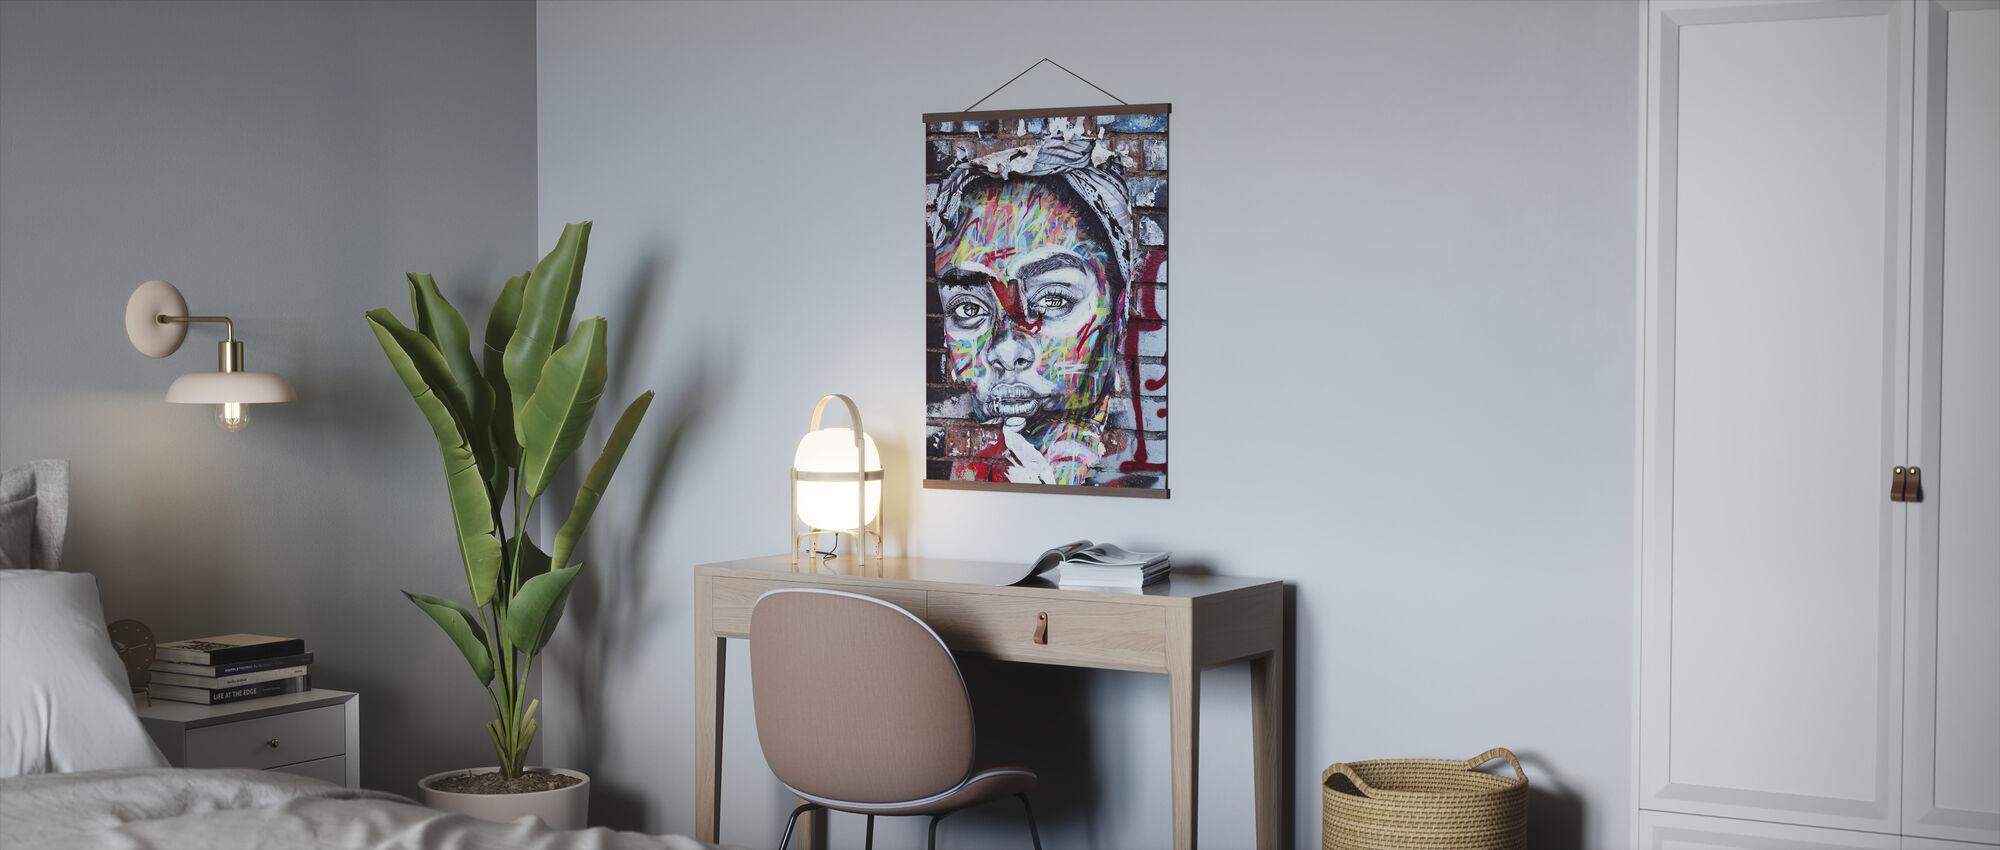 Gadekunst Portræt - Plakat - Kontor